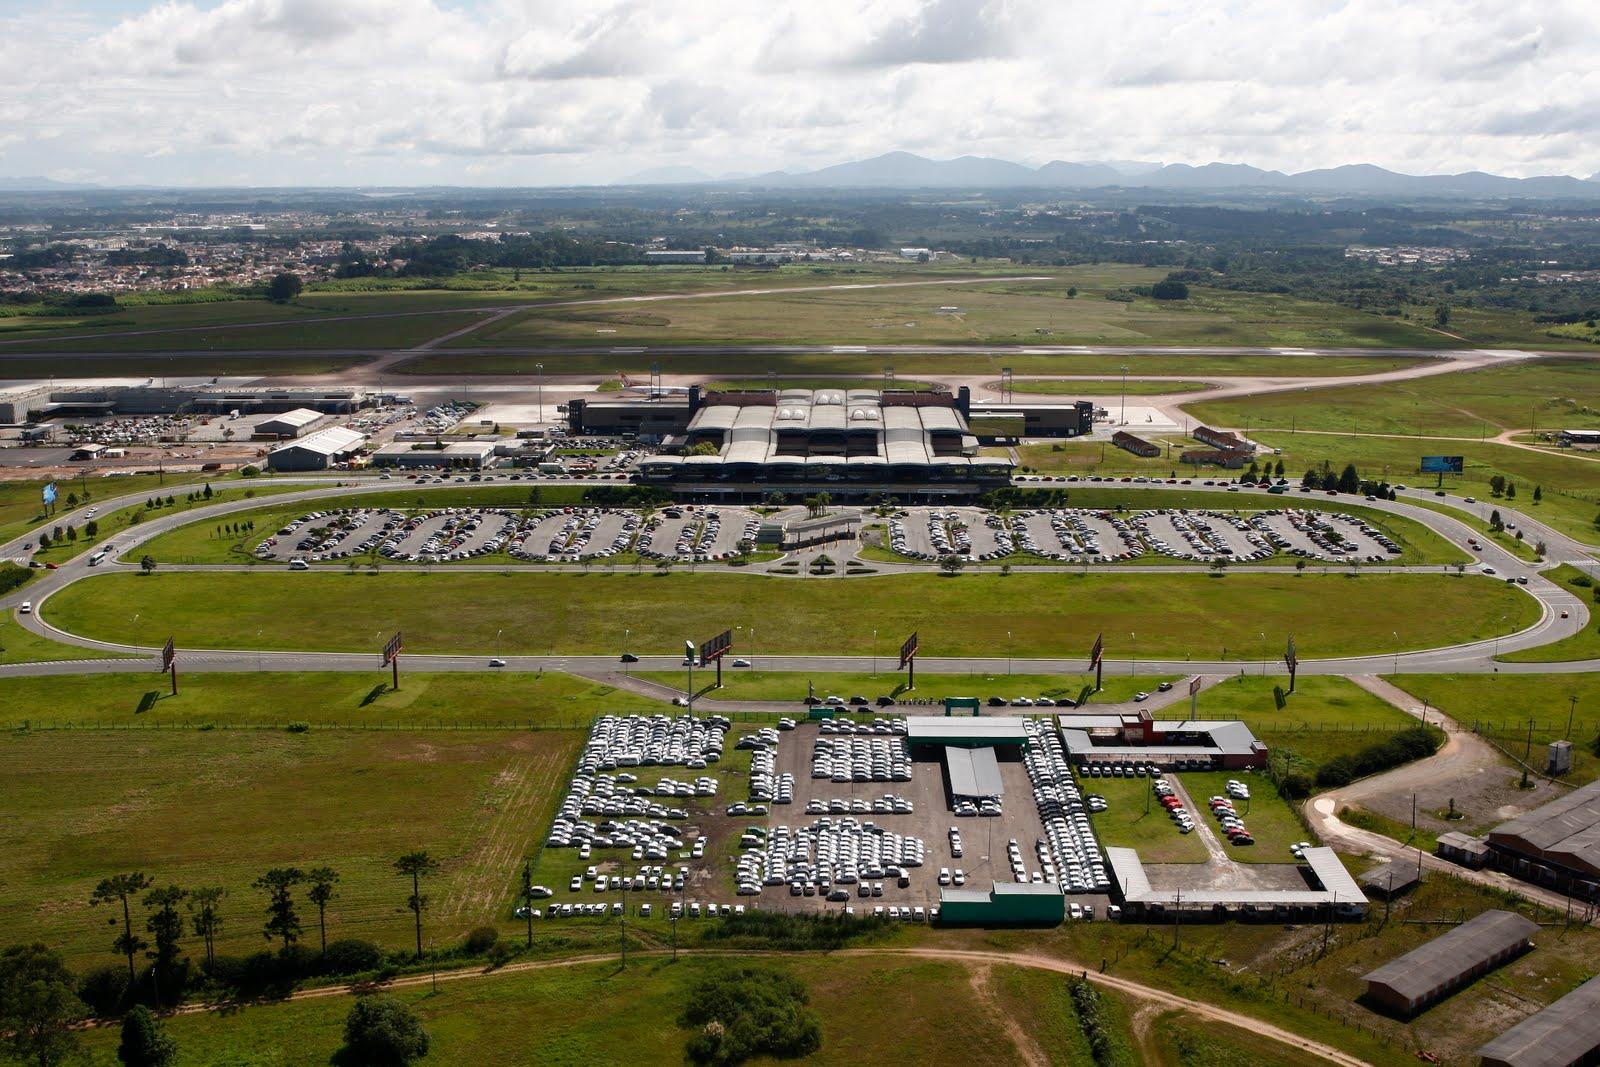 Aeroporto Afonso Pena : Sbct newspaper aeroporto internacional afonso pena